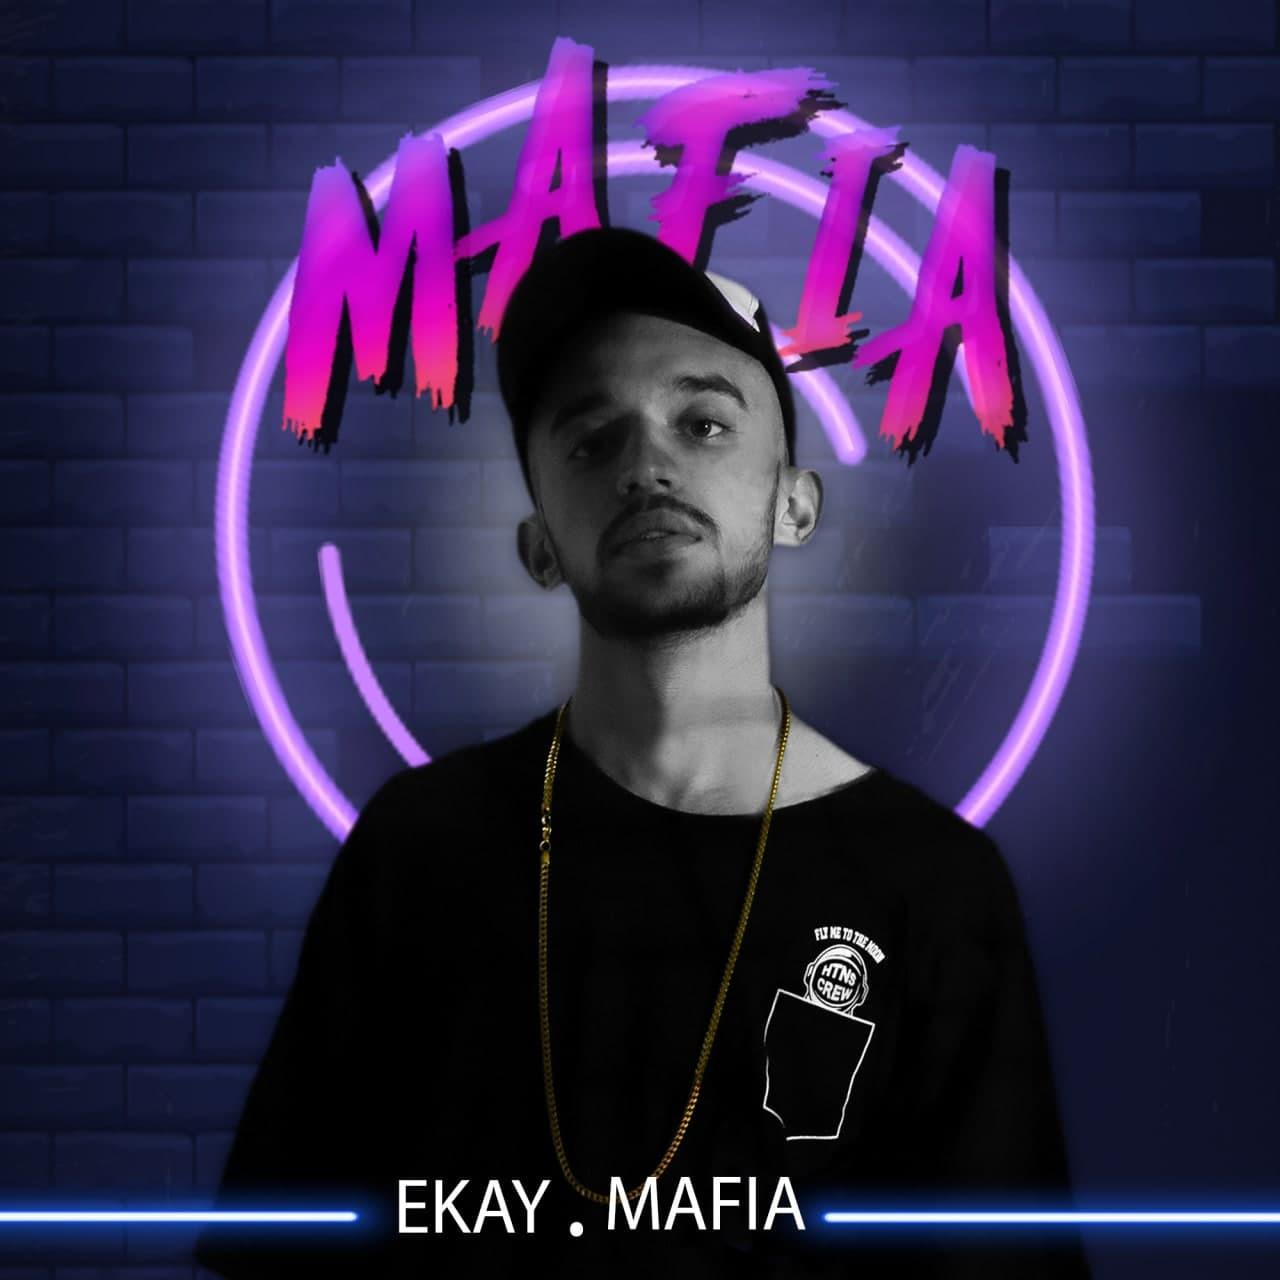 Ekay - Mafia